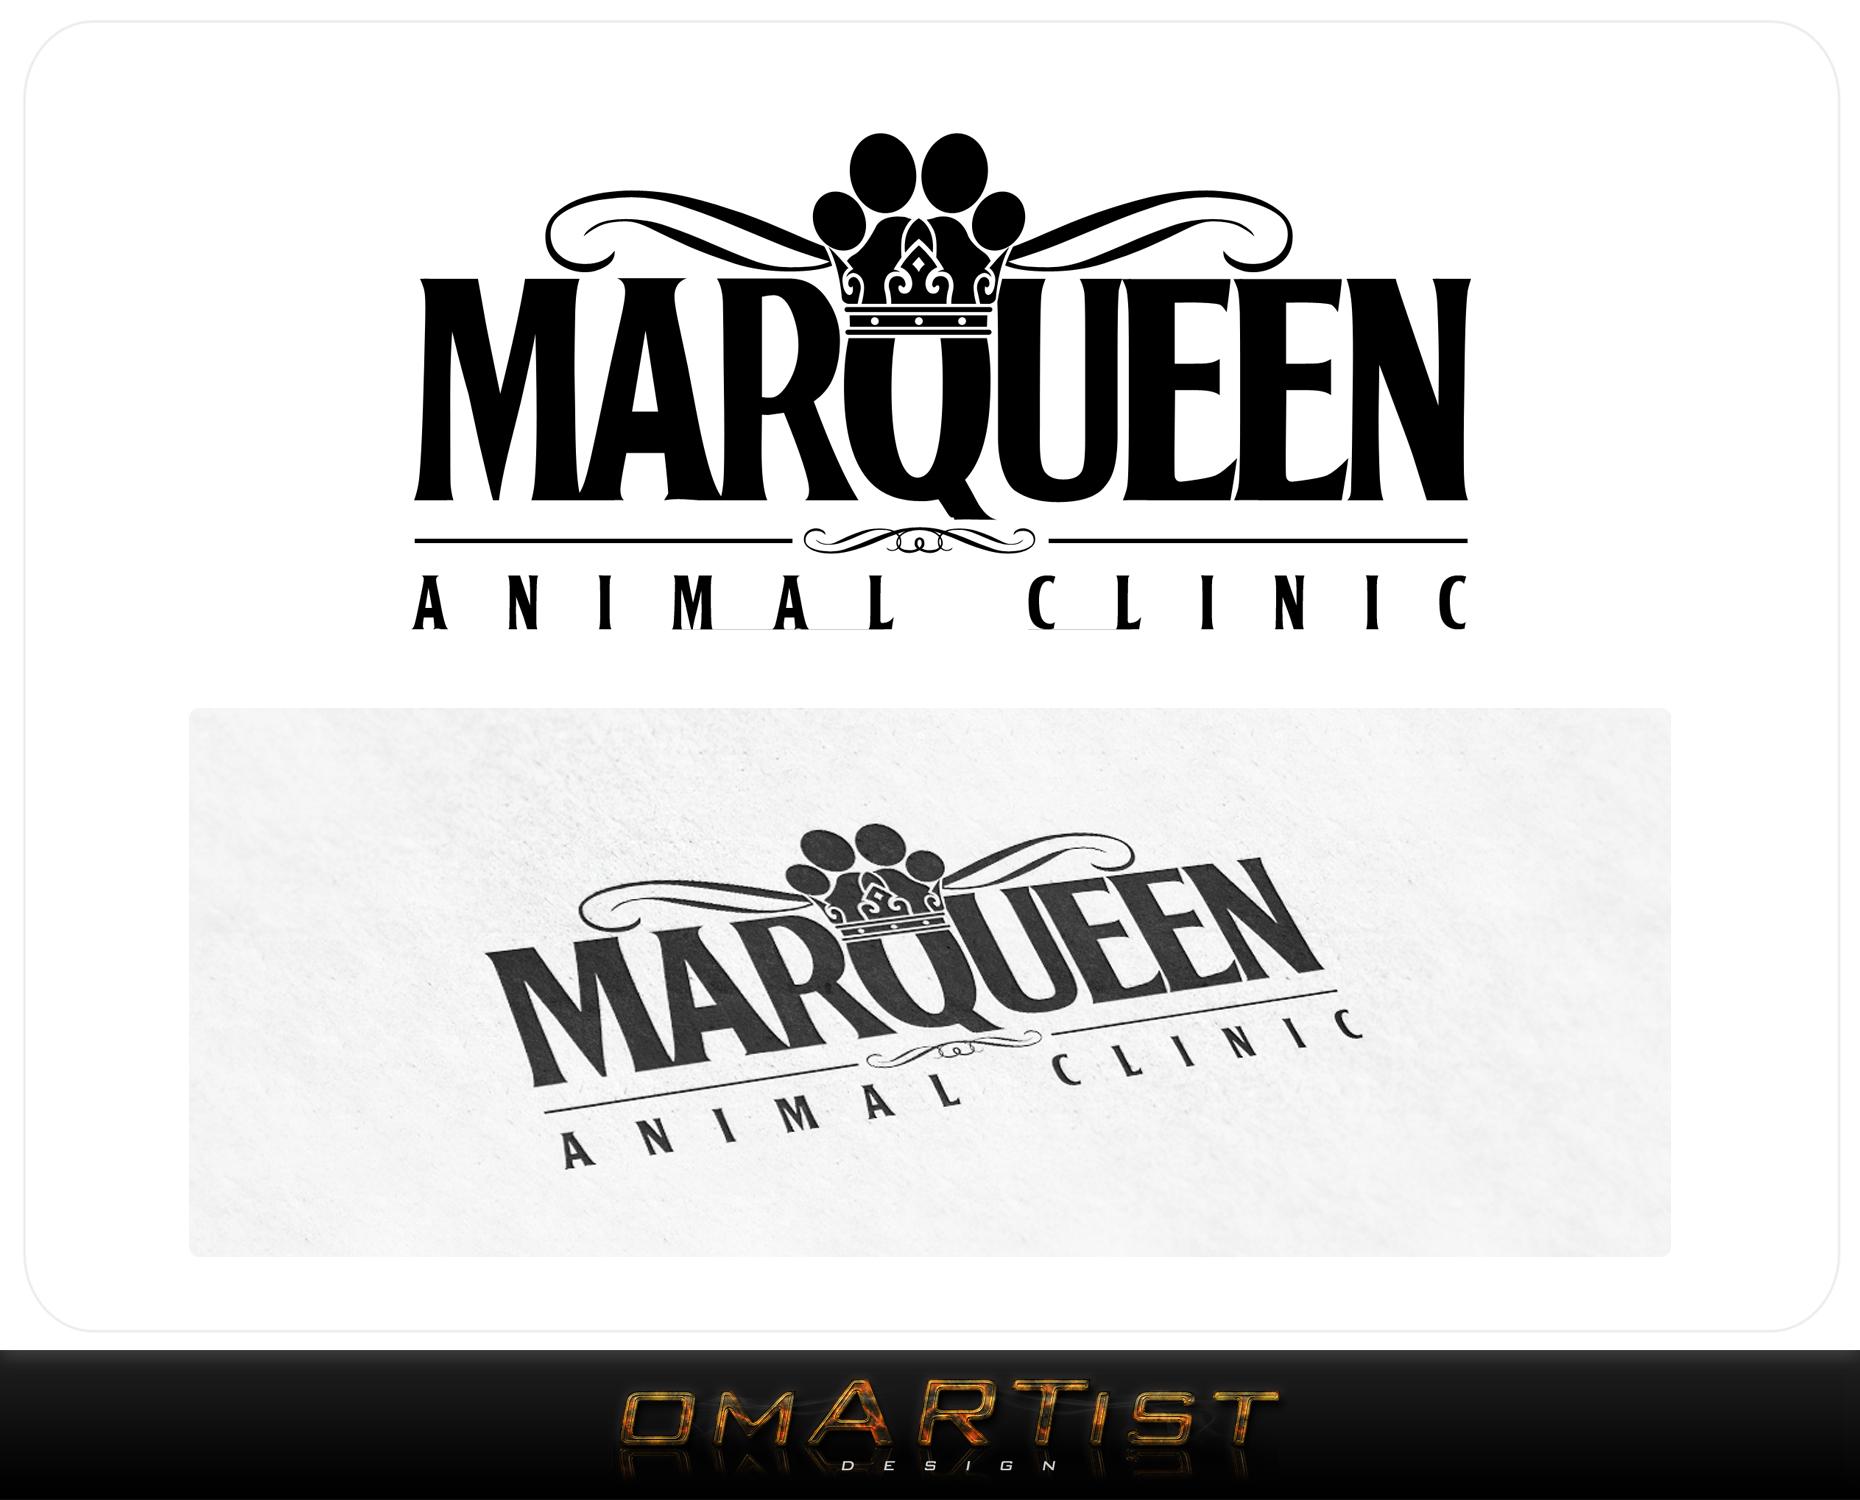 Logo Design by omARTist - Entry No. 169 in the Logo Design Contest Fun Logo Design for MarQueen Animal Clinic.